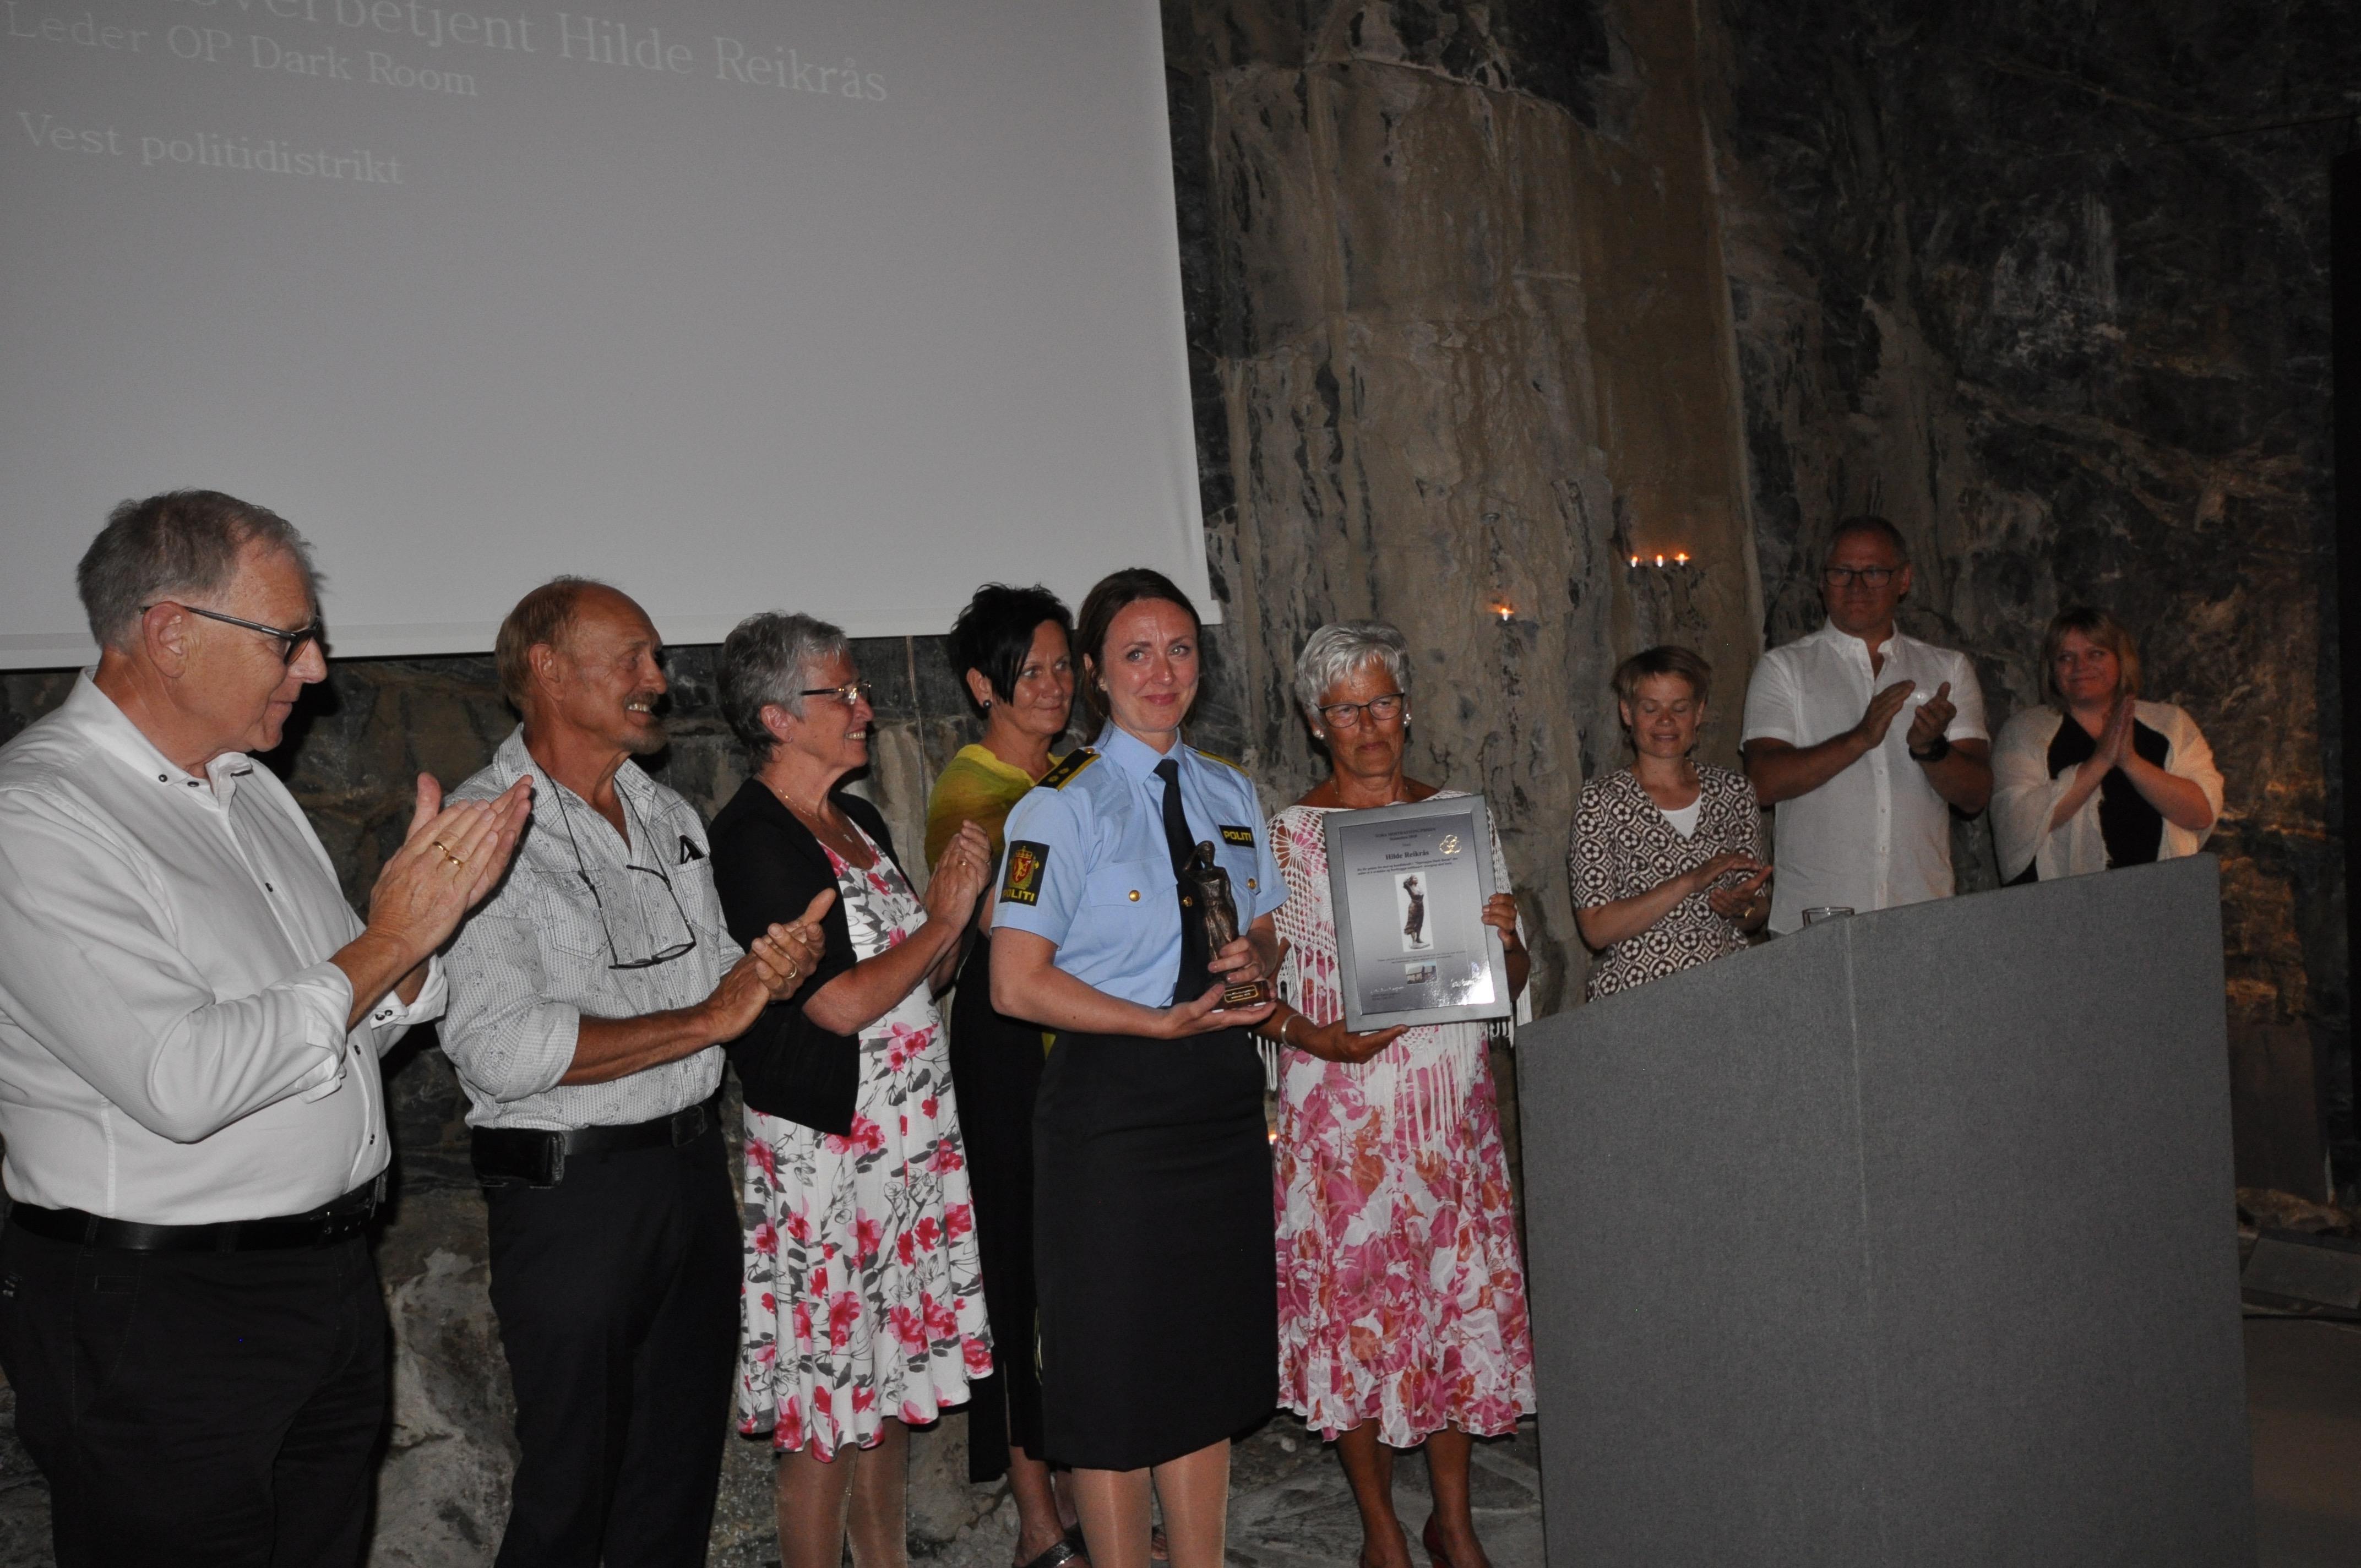 Styret og prisvinnar f.v.:Roald Sangolt, Johannes Hjelland, Sissel Jørgensen Hilde Reikrås (prisvinnar), Haldri Karin Engenes, Kristi Staveland-Sæter, Frode Larsen, Astrid Drevland